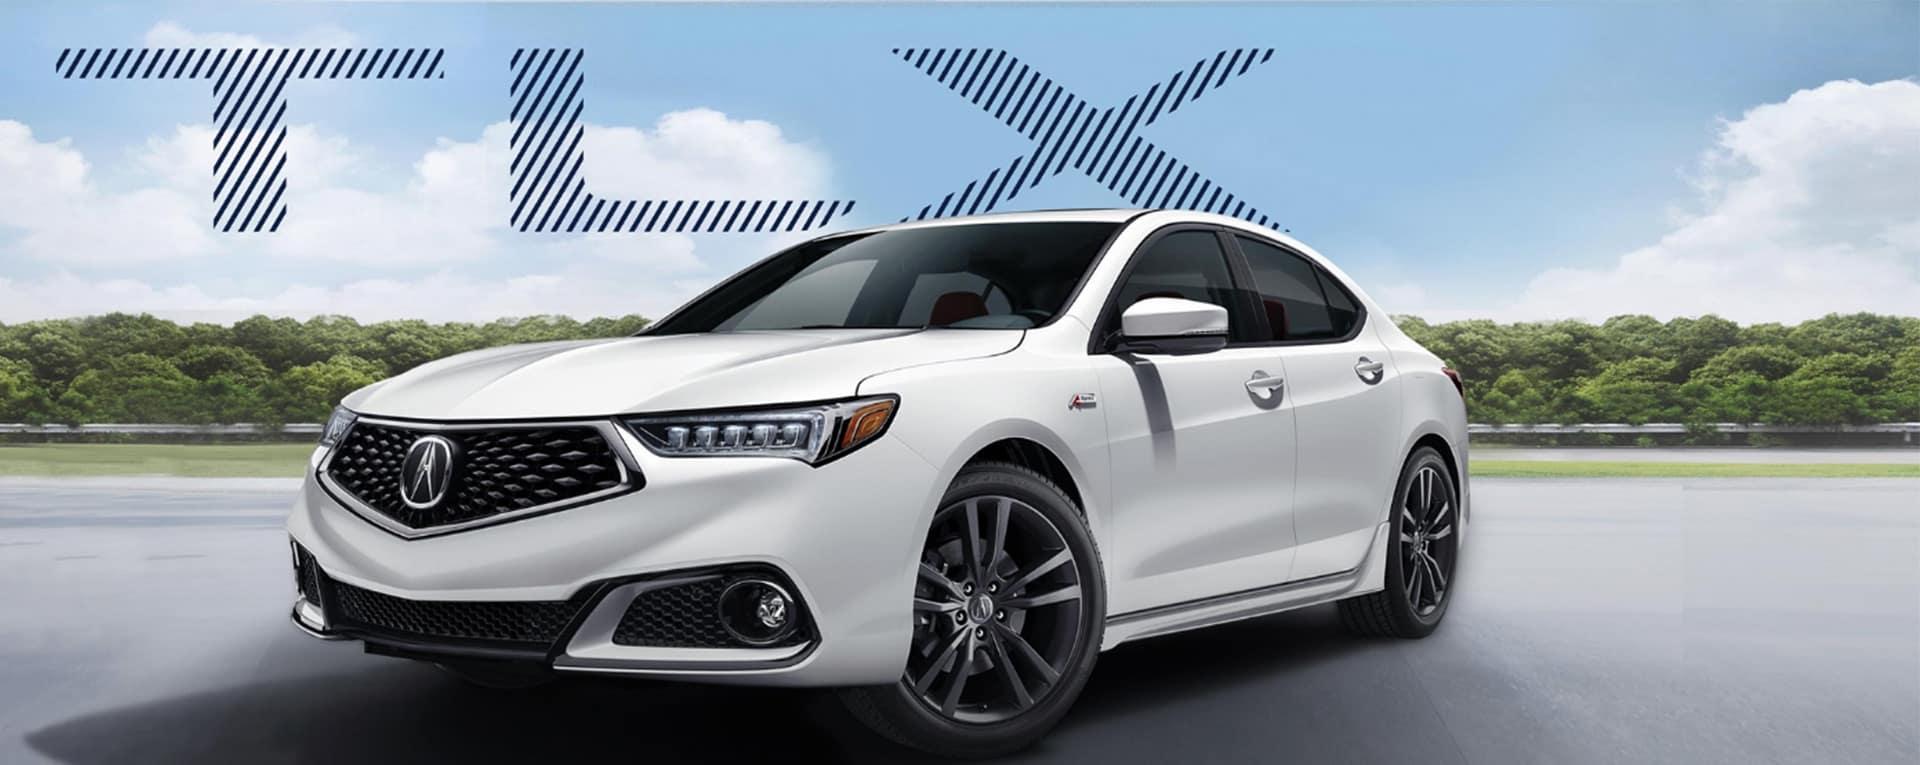 Southeast Florida Acura Dealers 2019 TLX